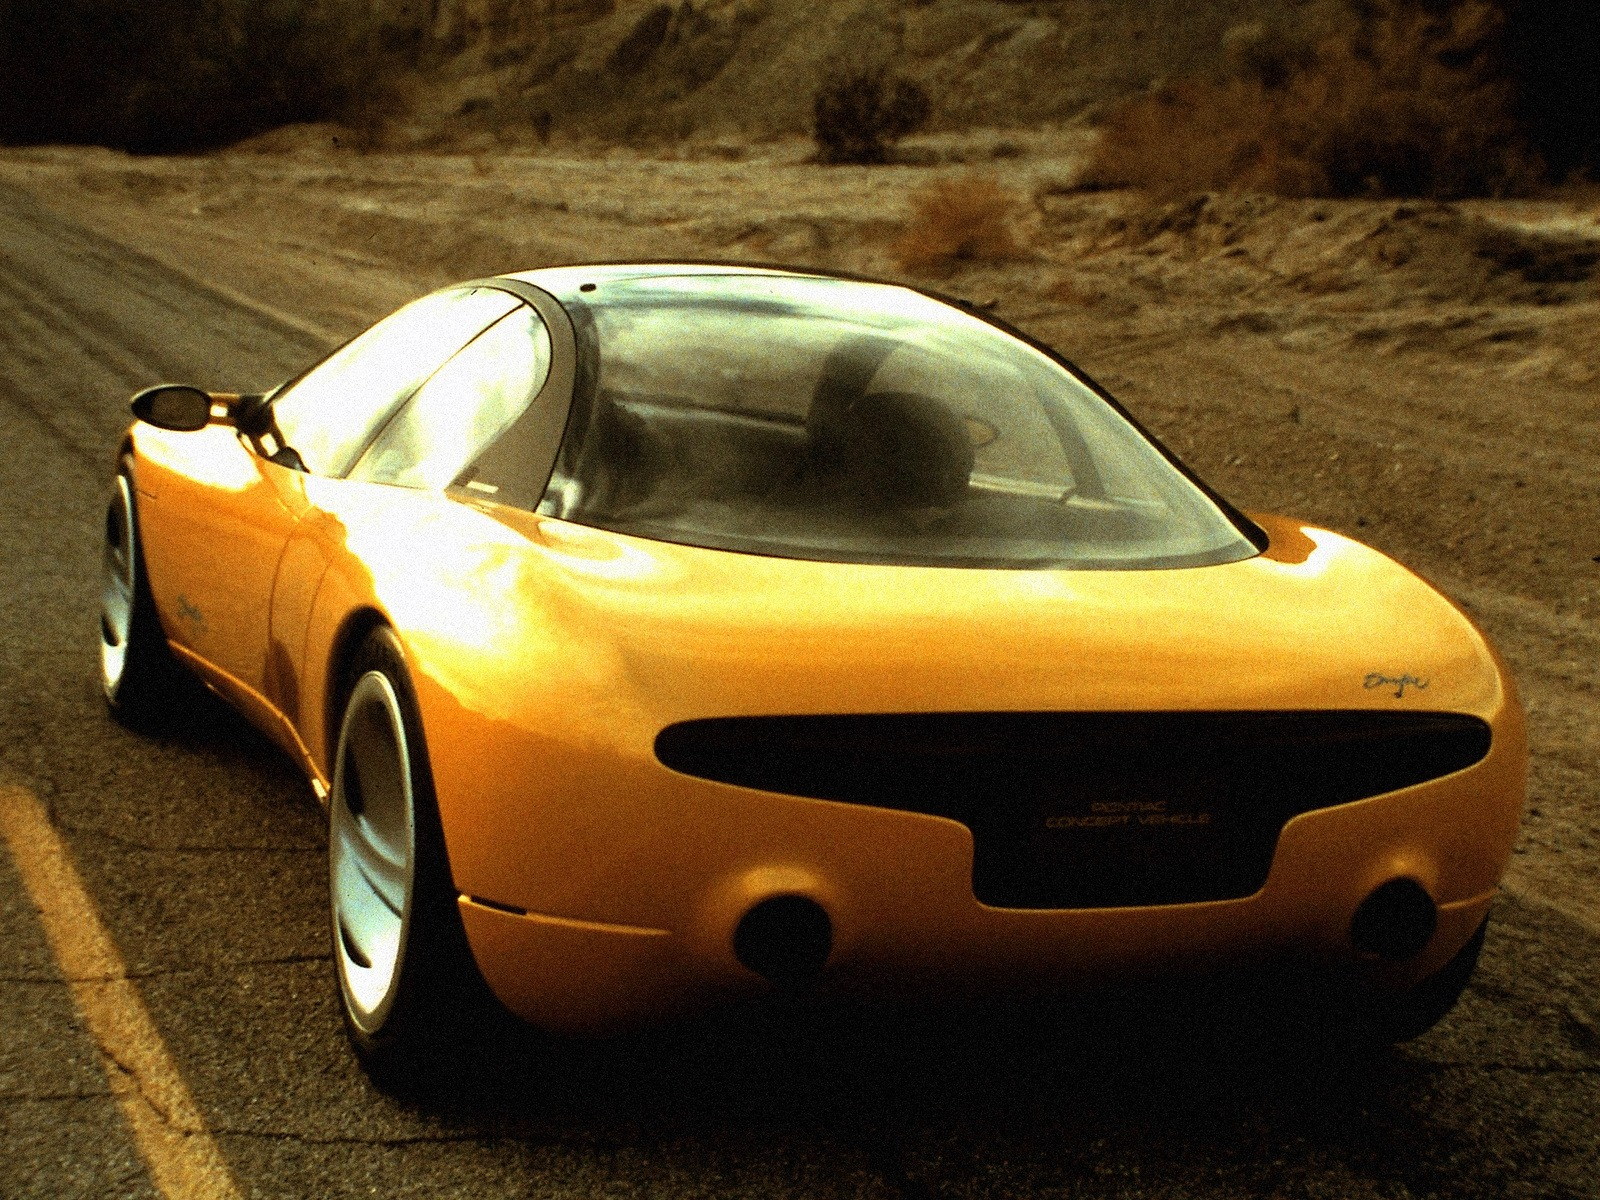 Top 10 Fastest Cars >> Pontiac Sunfire Concept (1990) - Old Concept Cars